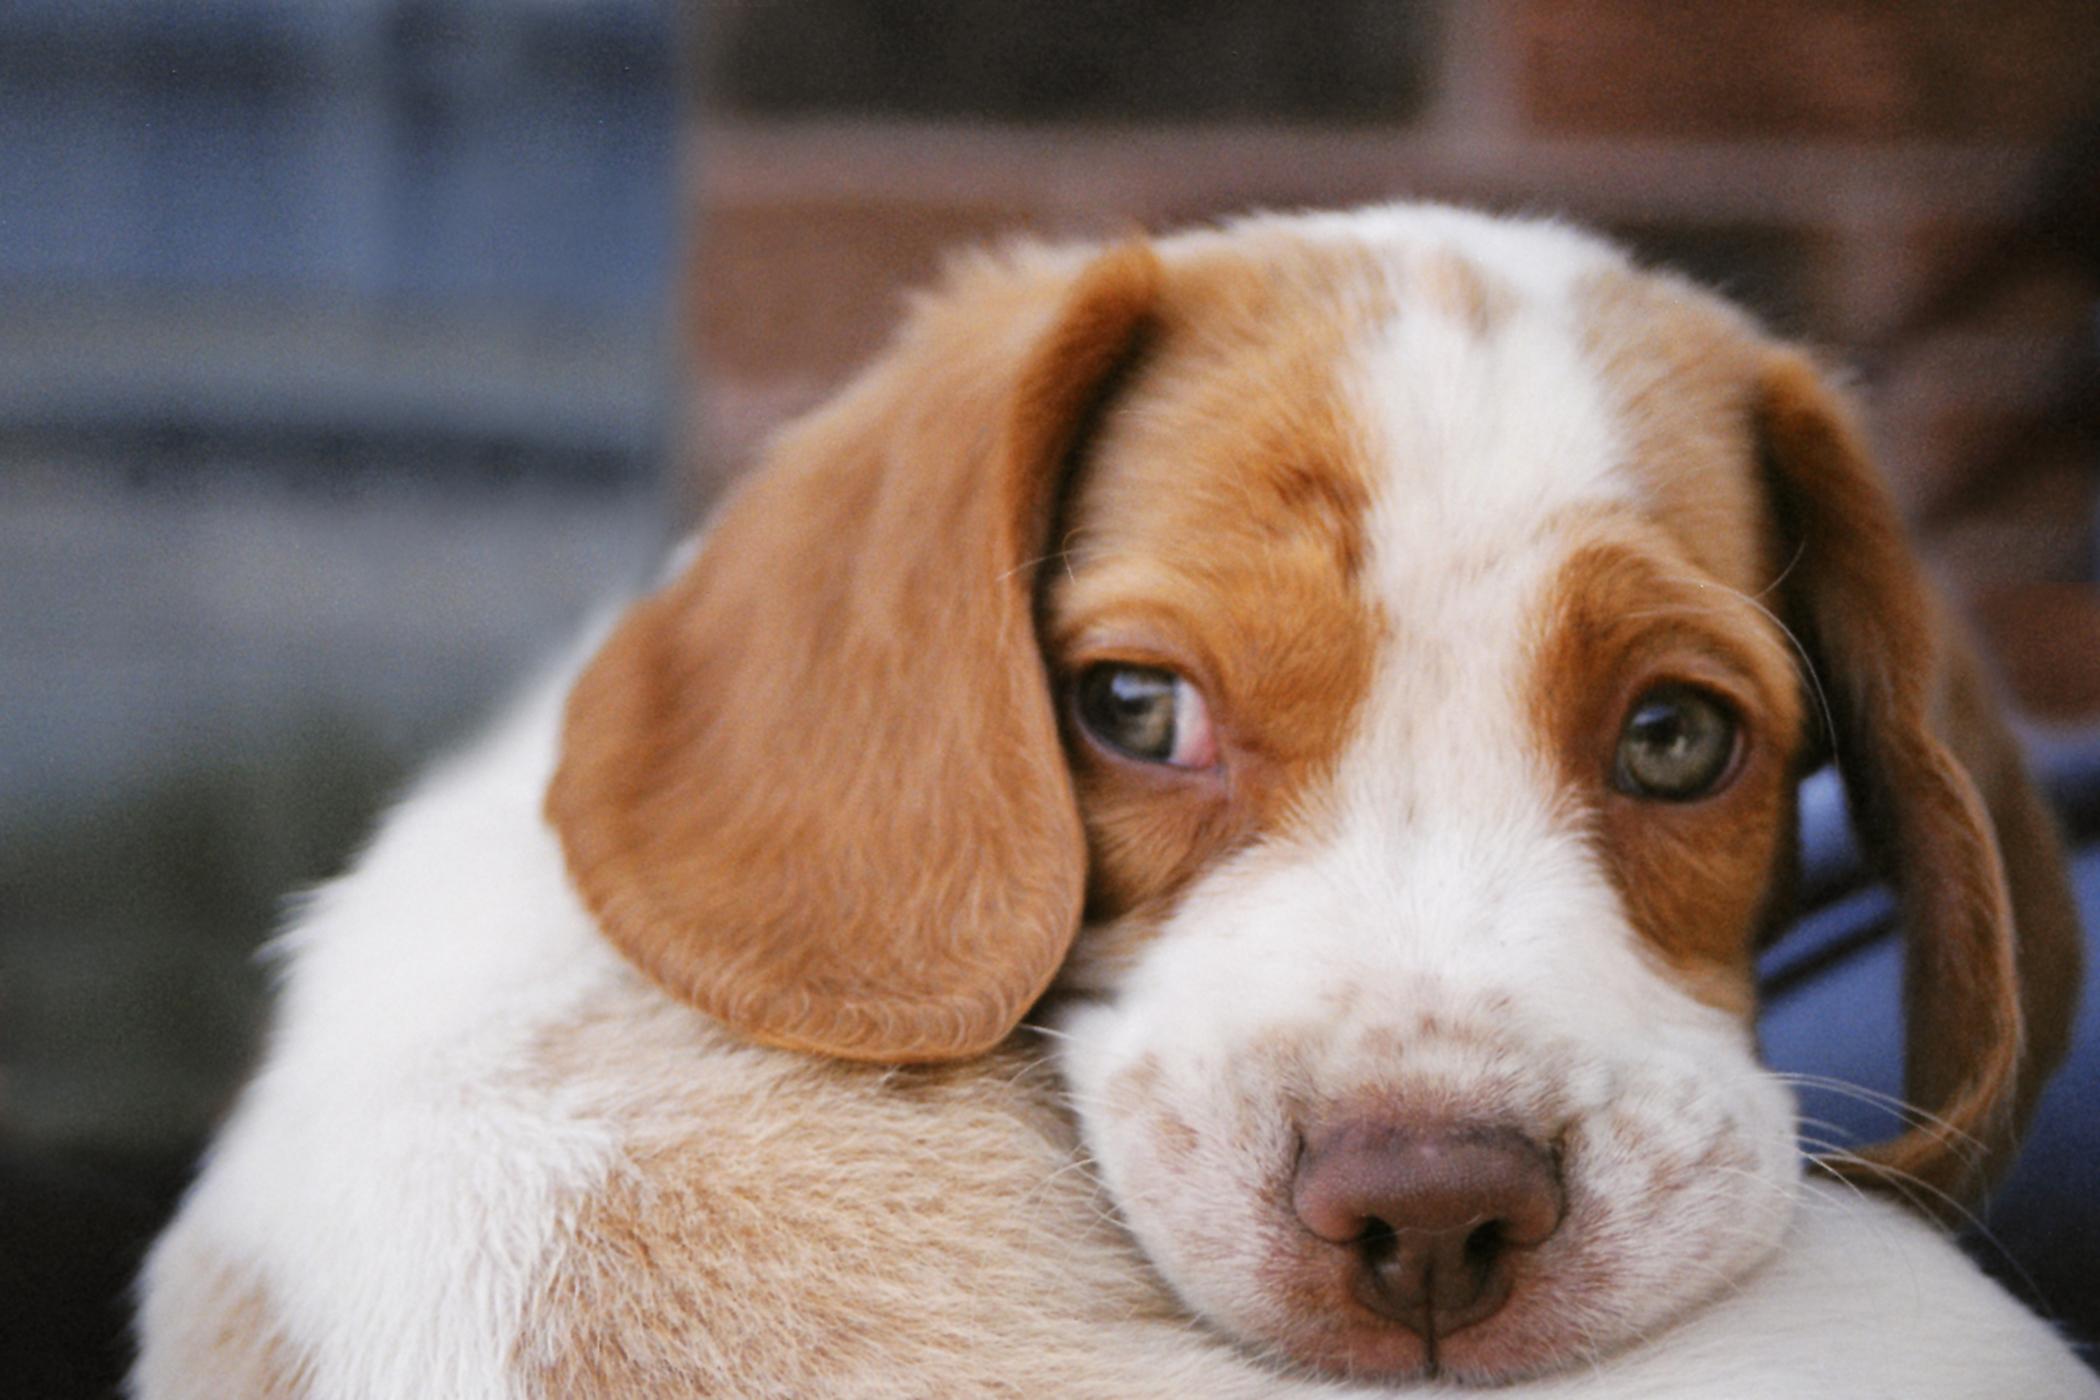 Dorsal Rhinotomy in Dogs